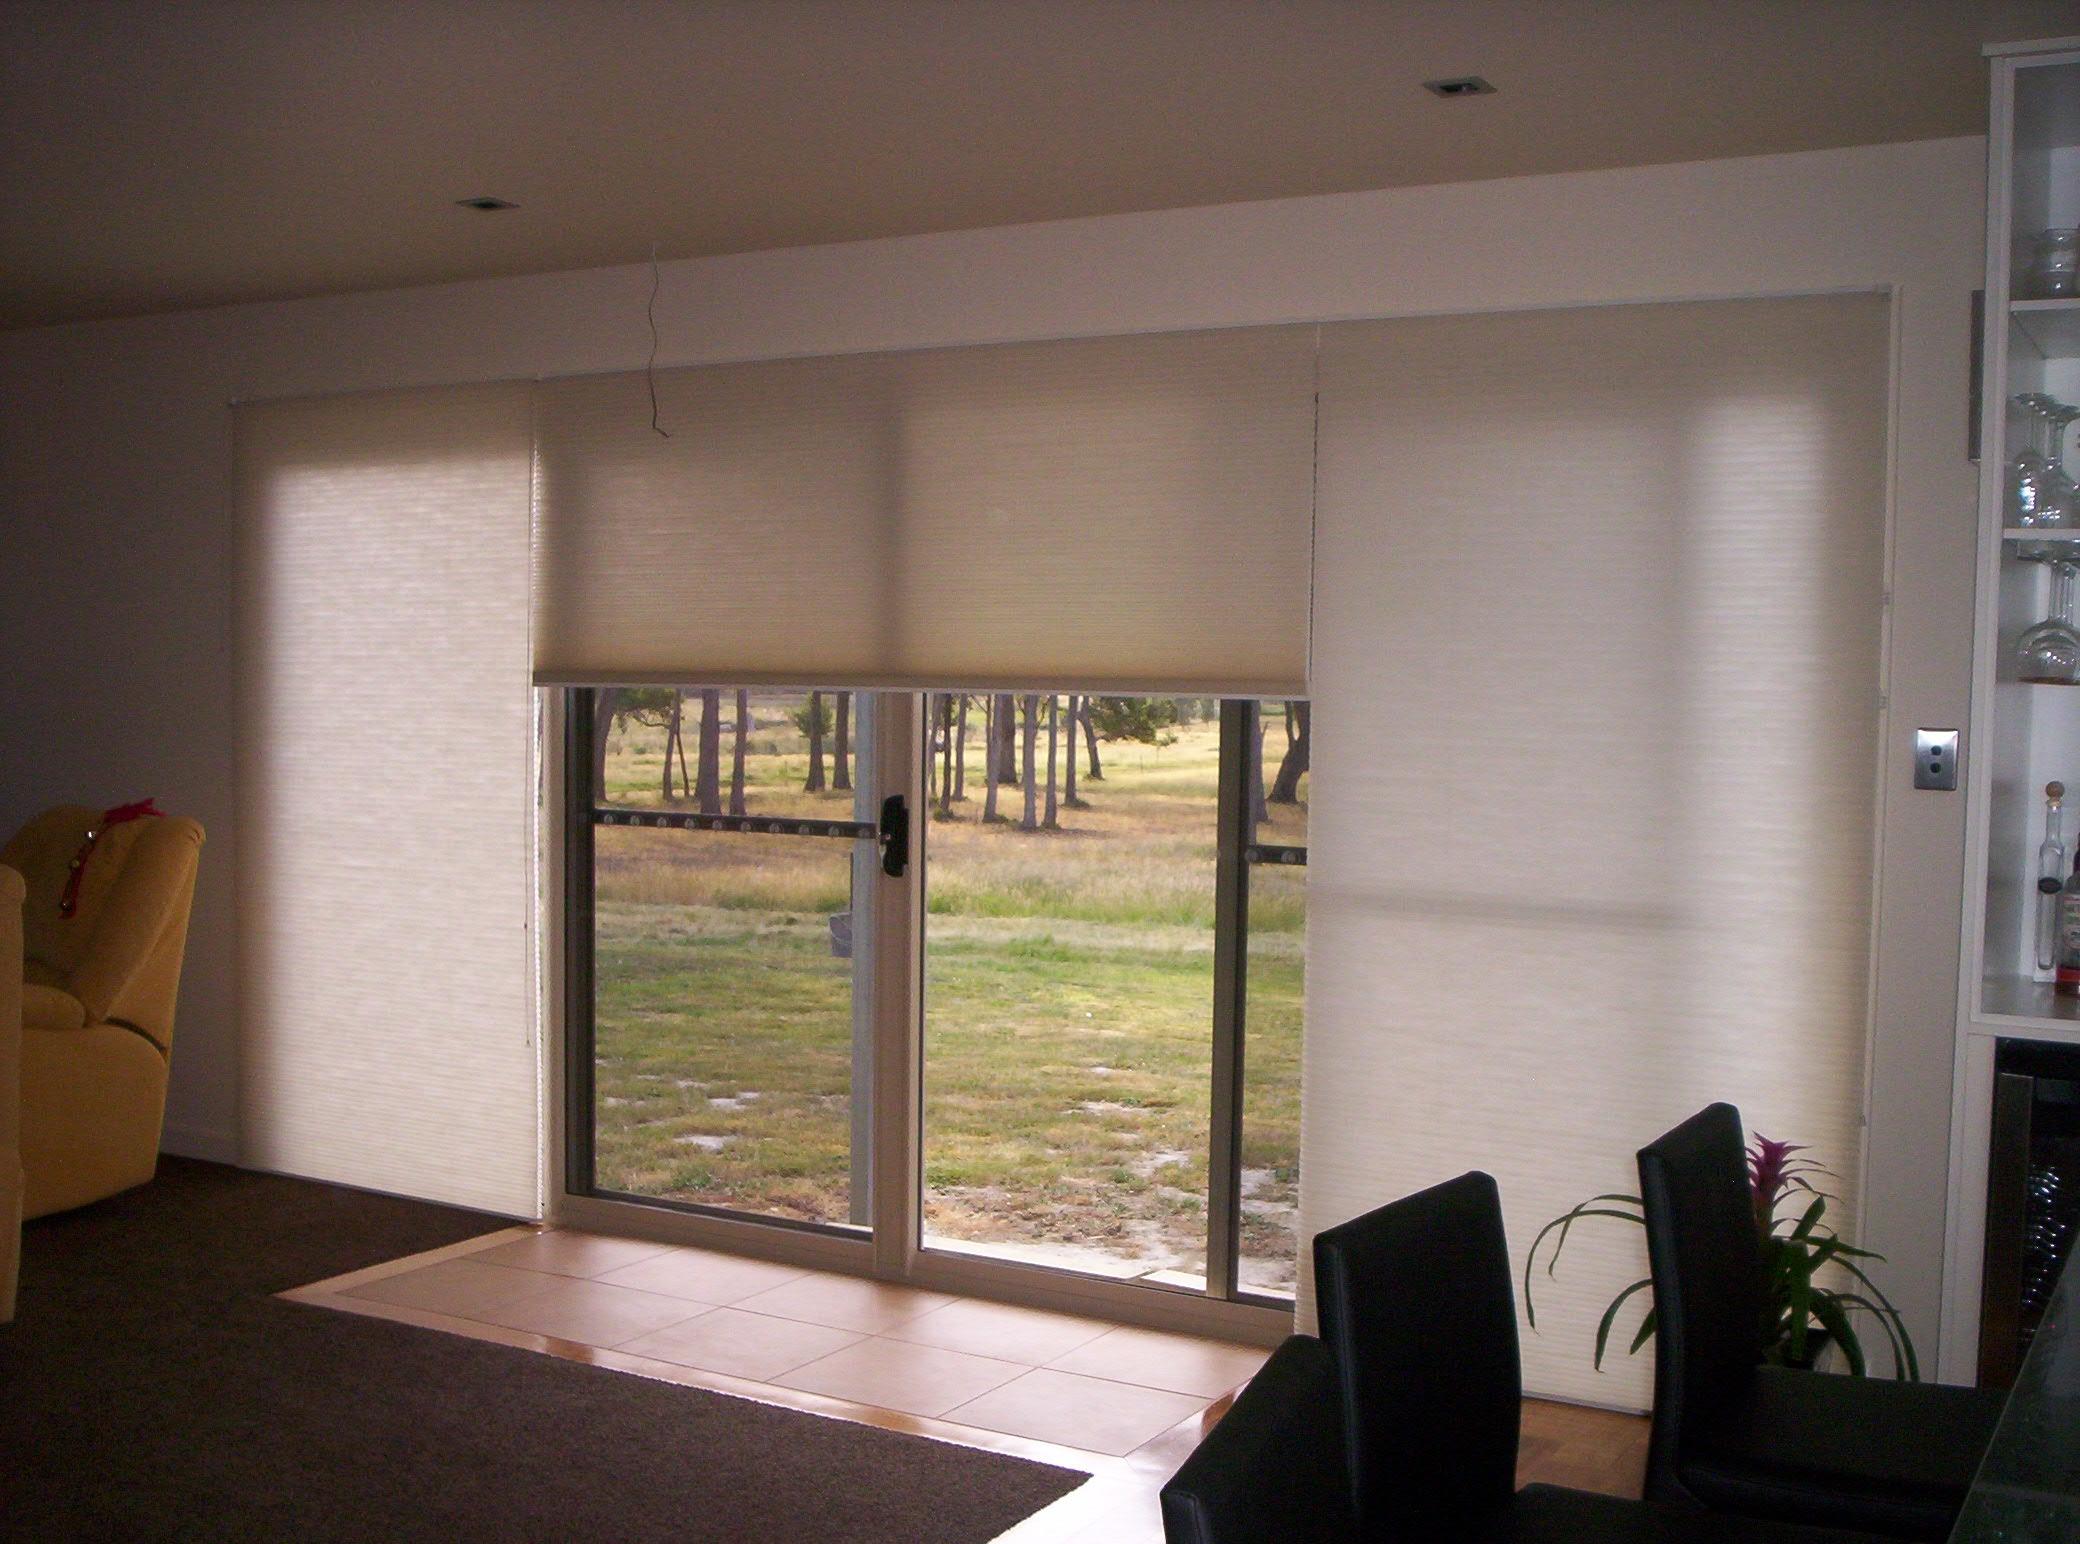 Sun Blocking Shades For Sliding Glass Doorssliding door blinds image of sliding glass door electric blinds